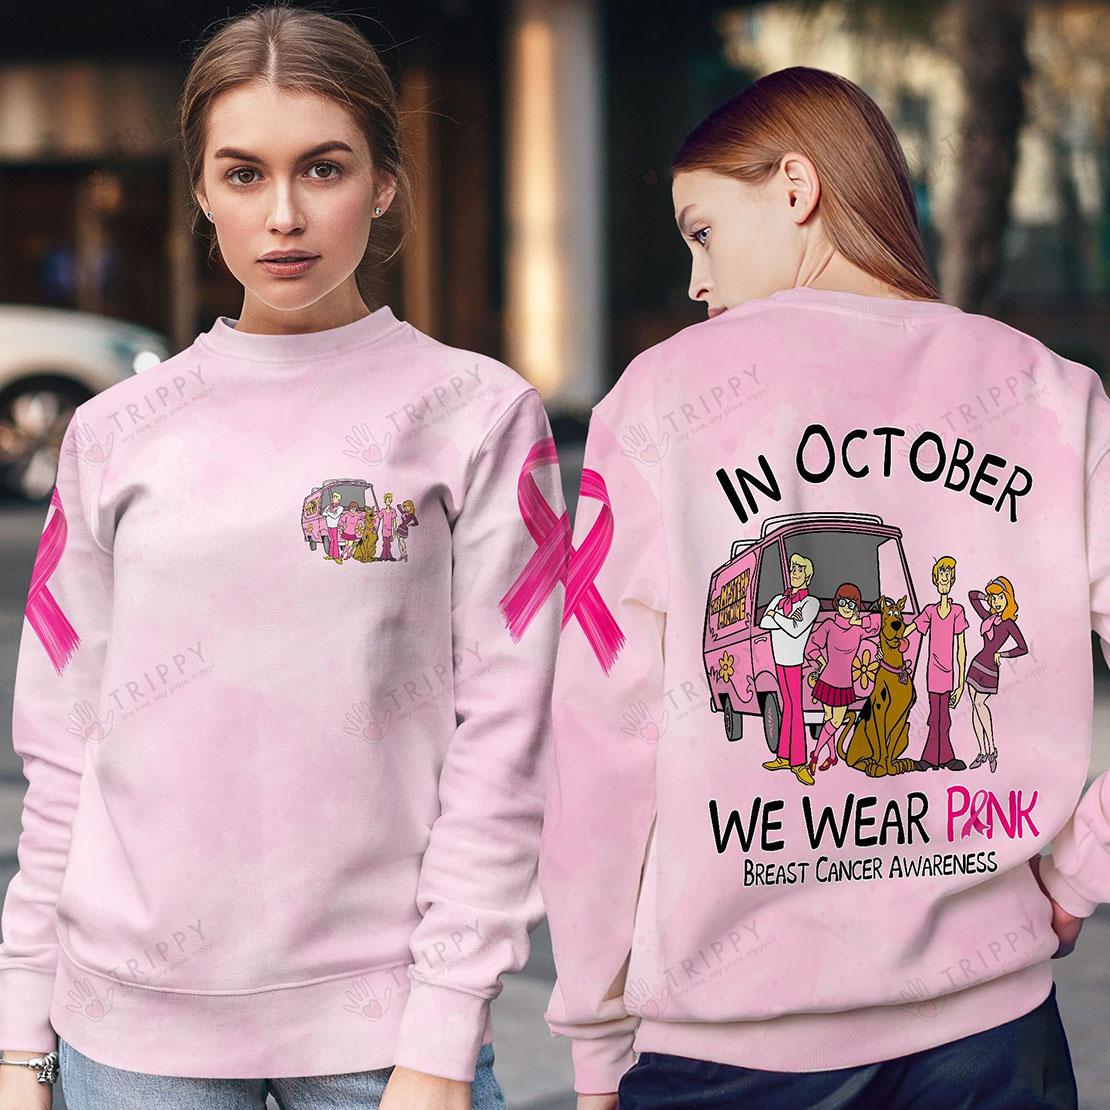 Scooby Doo In October We Wear Pink Breast Cancer Awareness 3D All Over Printed Sweatshirt